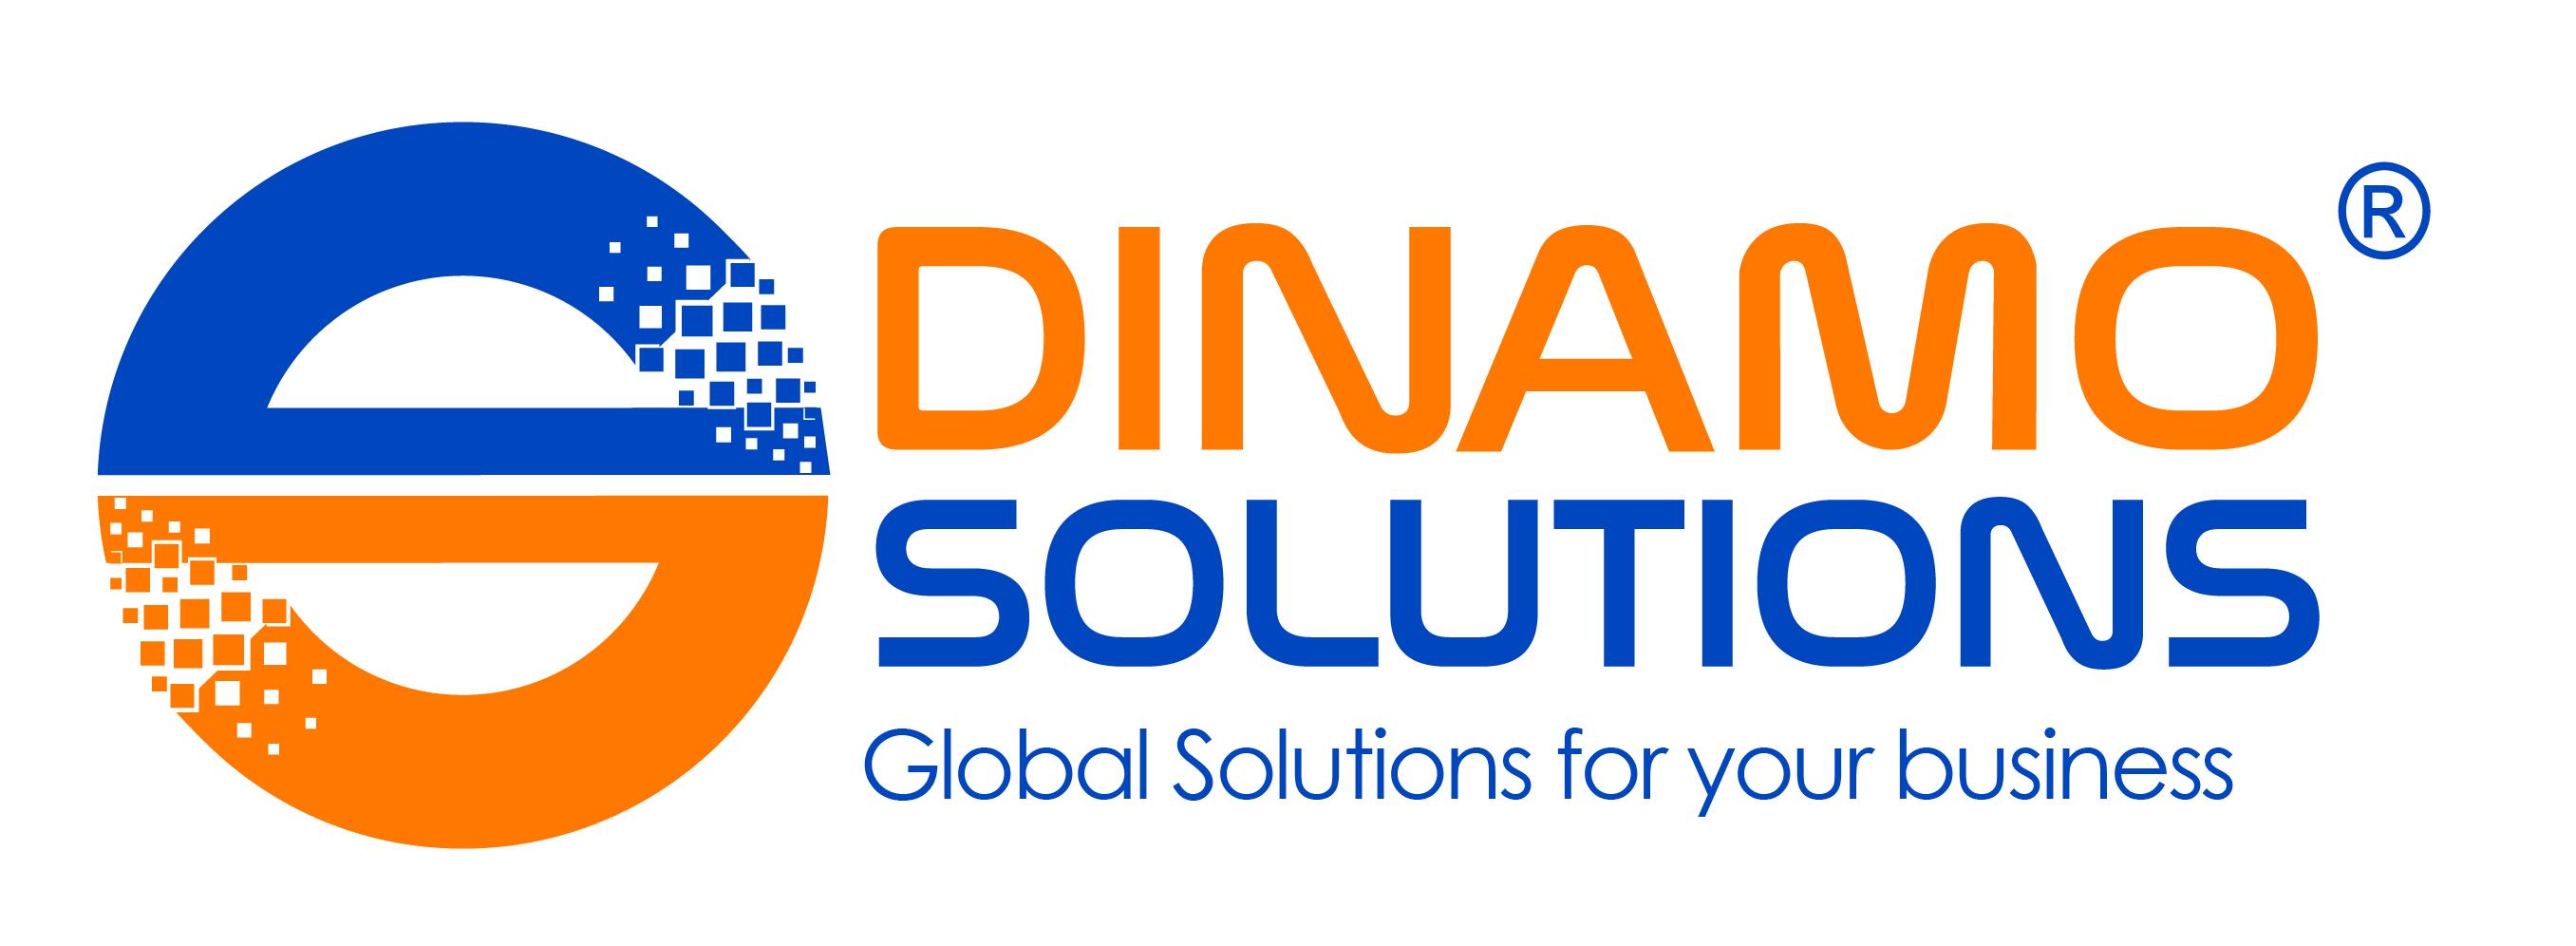 Dinamo Solutions